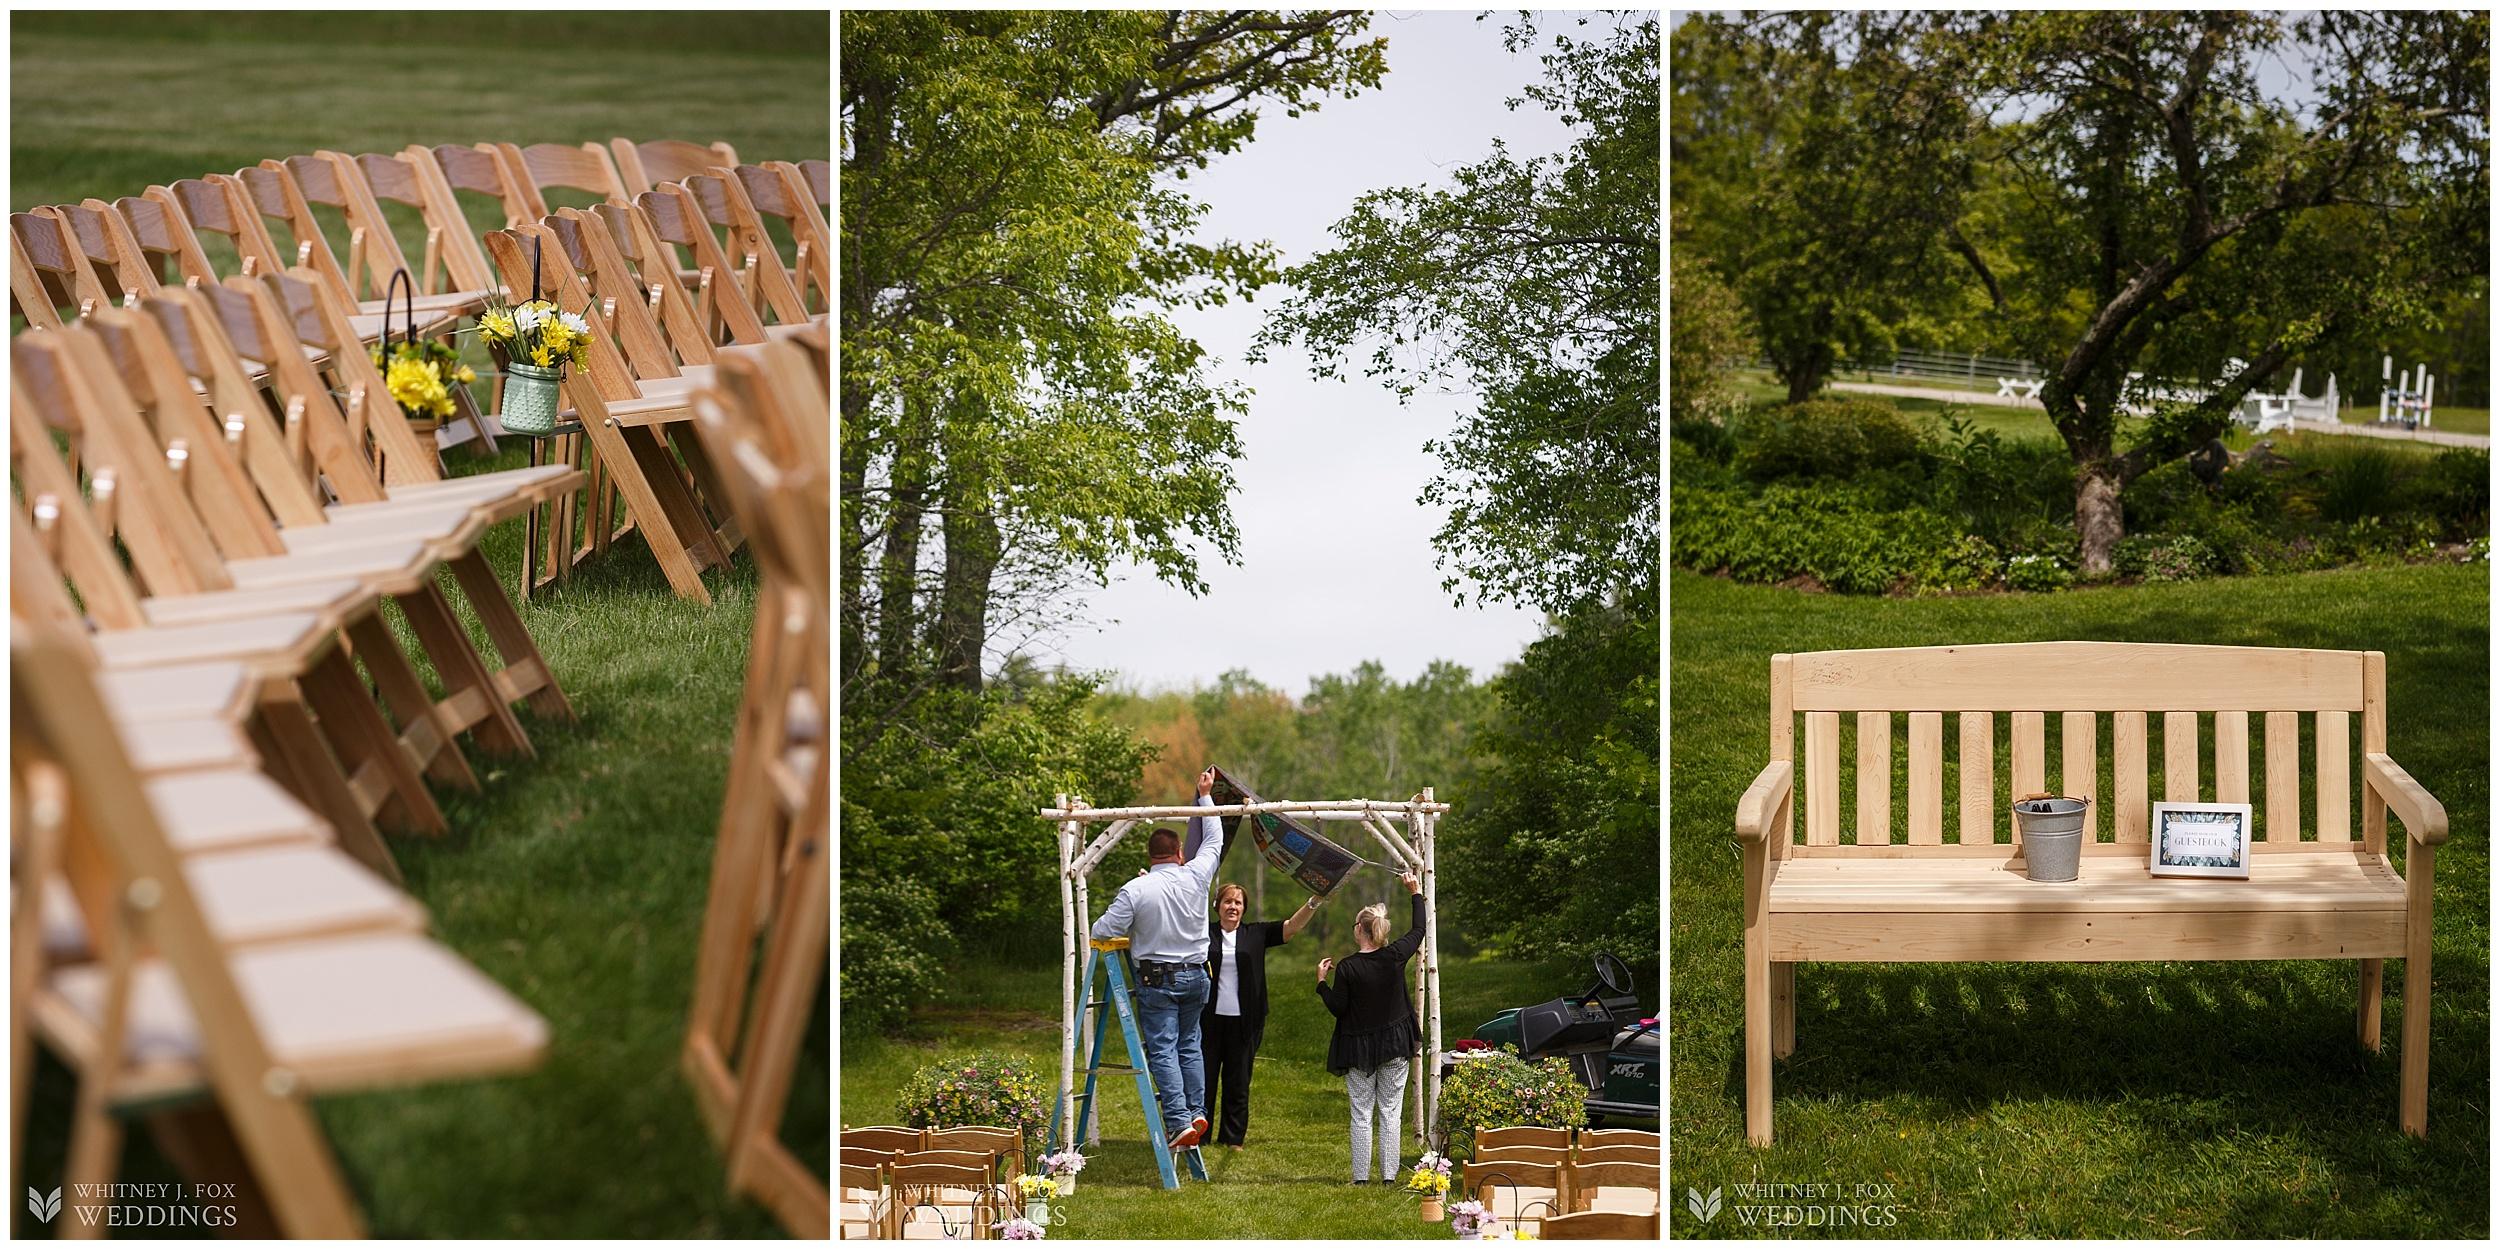 11_21_tai_josh_the_homestead_rest_be_thankful_farm_lyman_maine_photographer_whitney_j_fox_weddings_0672.jpg